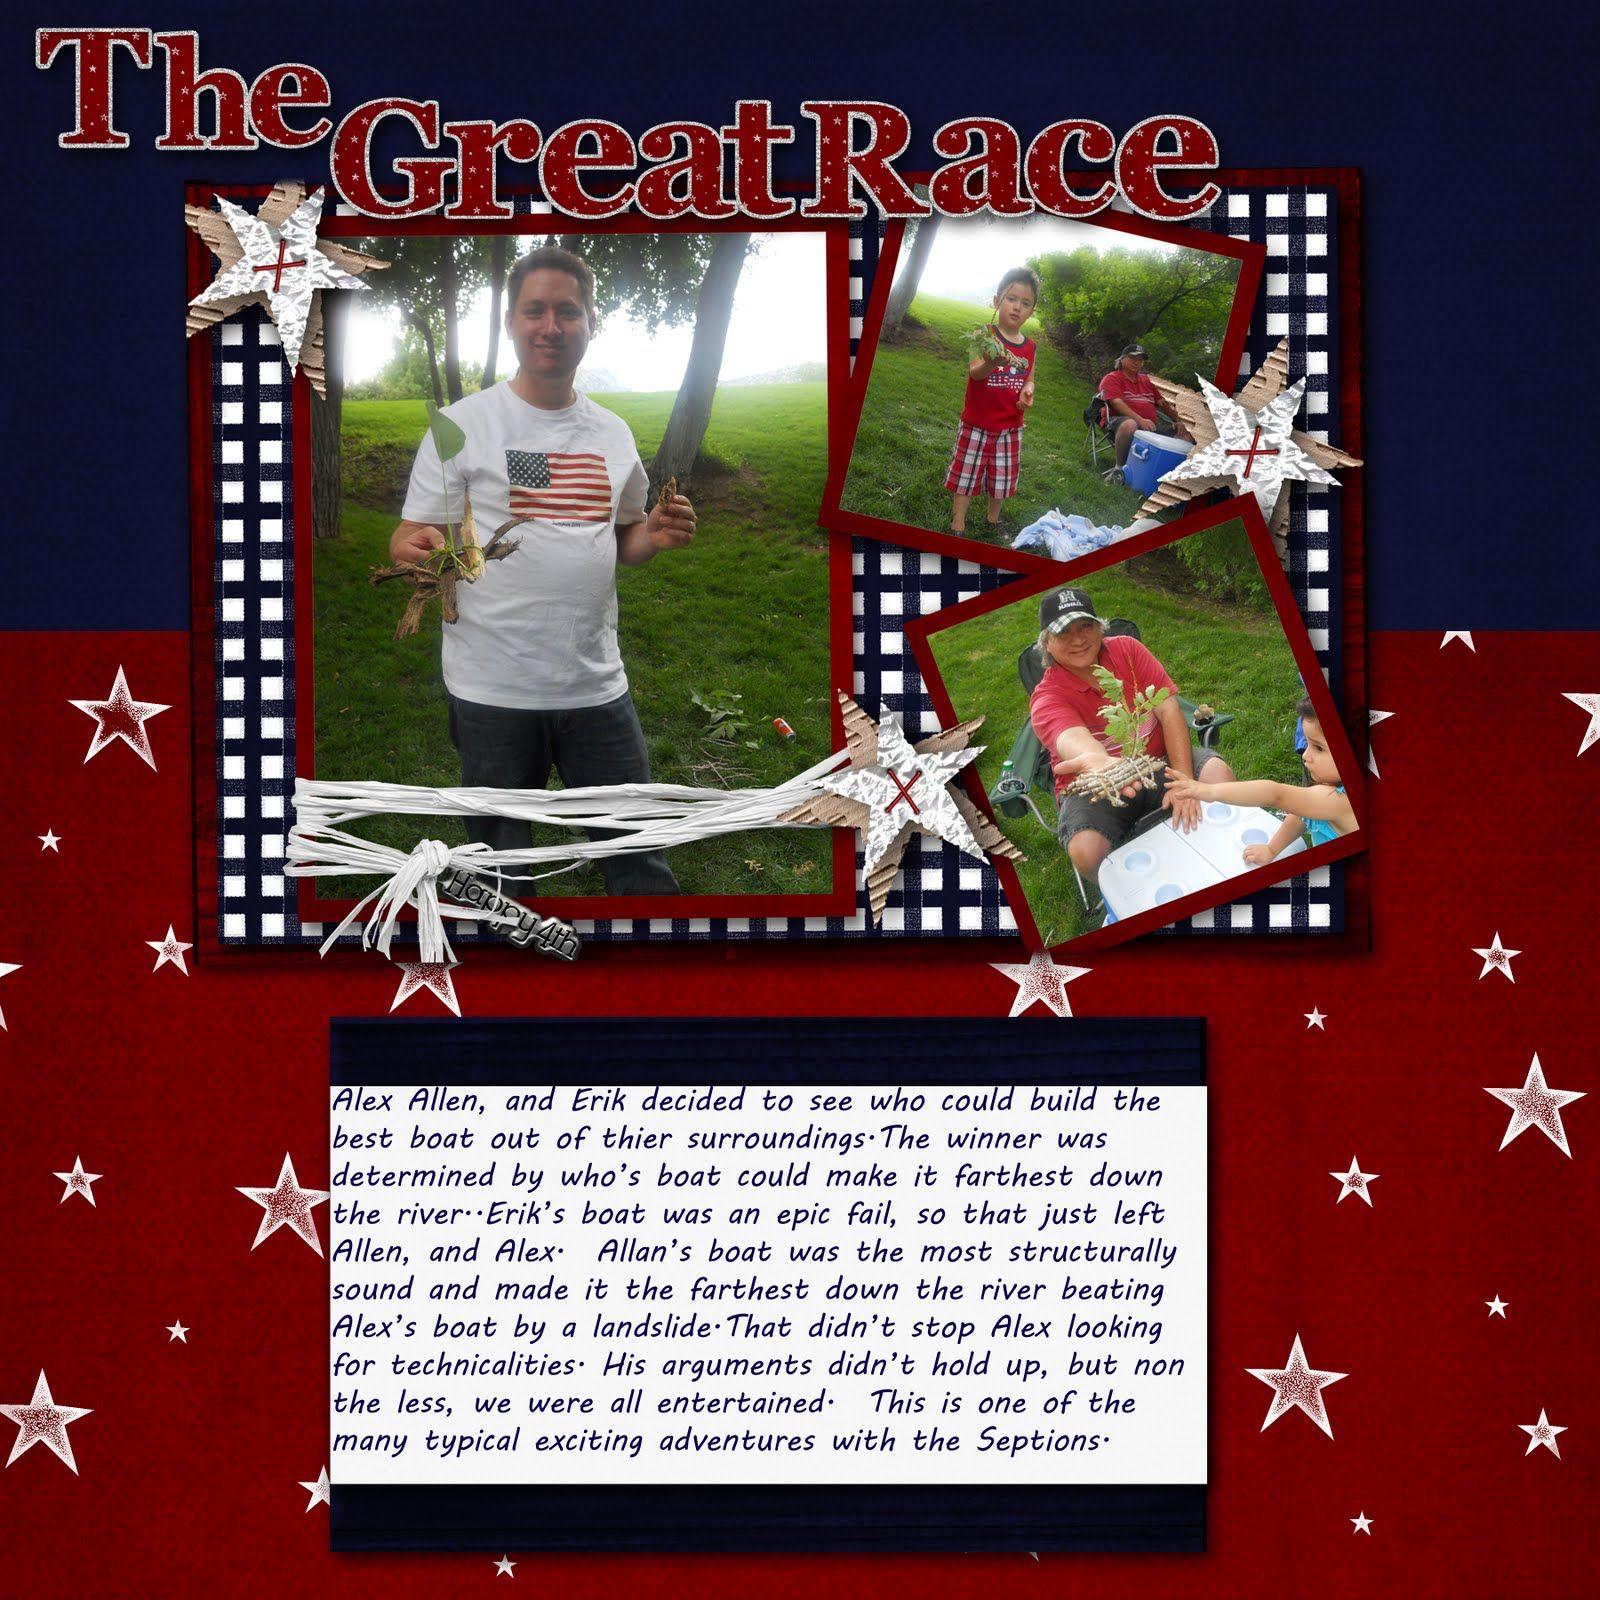 The+Great+Race+copy.jpg (1600×1600)